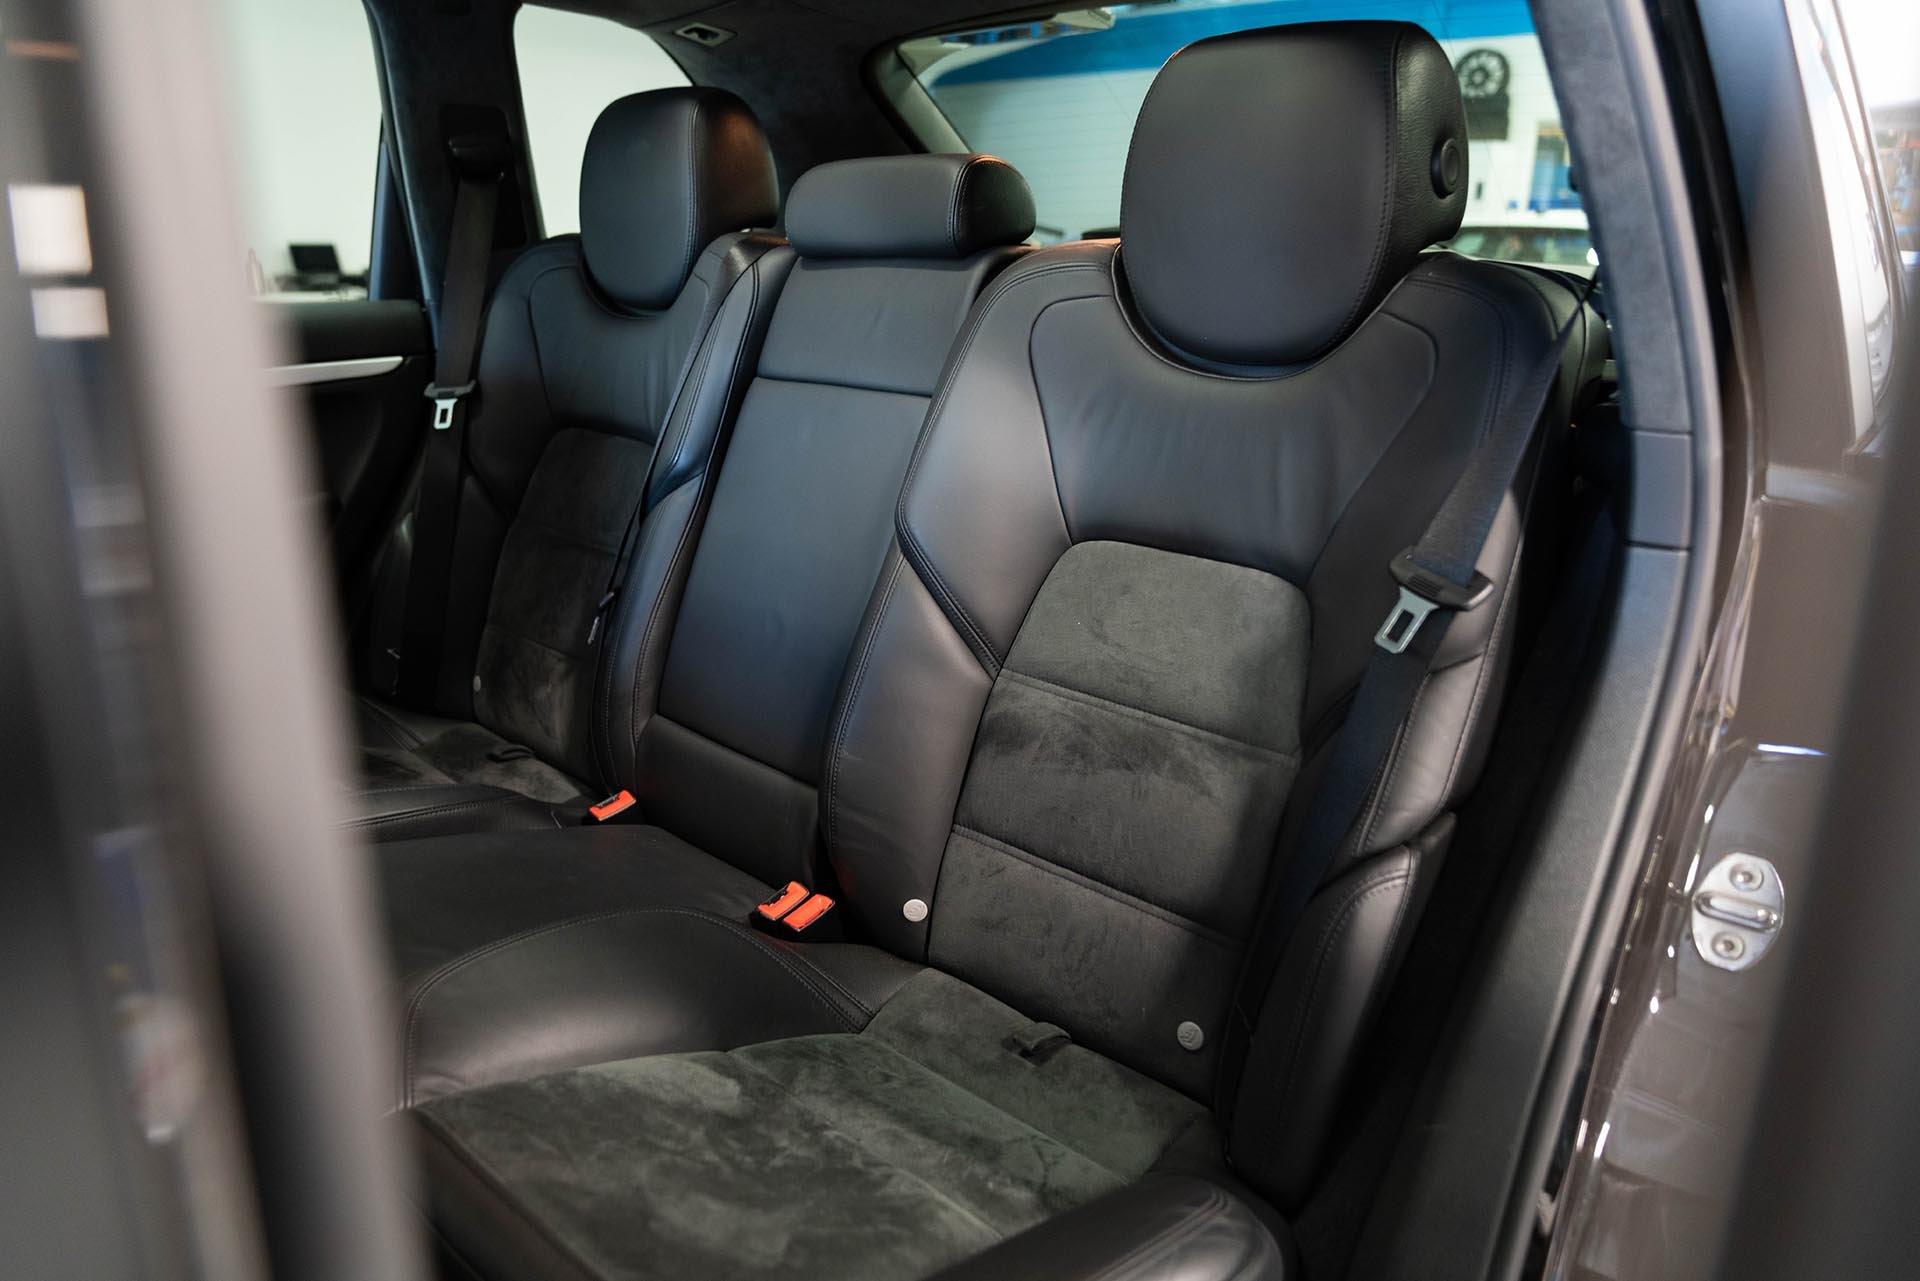 02_Porsche Cayenne 957 GTS rear seats black on black